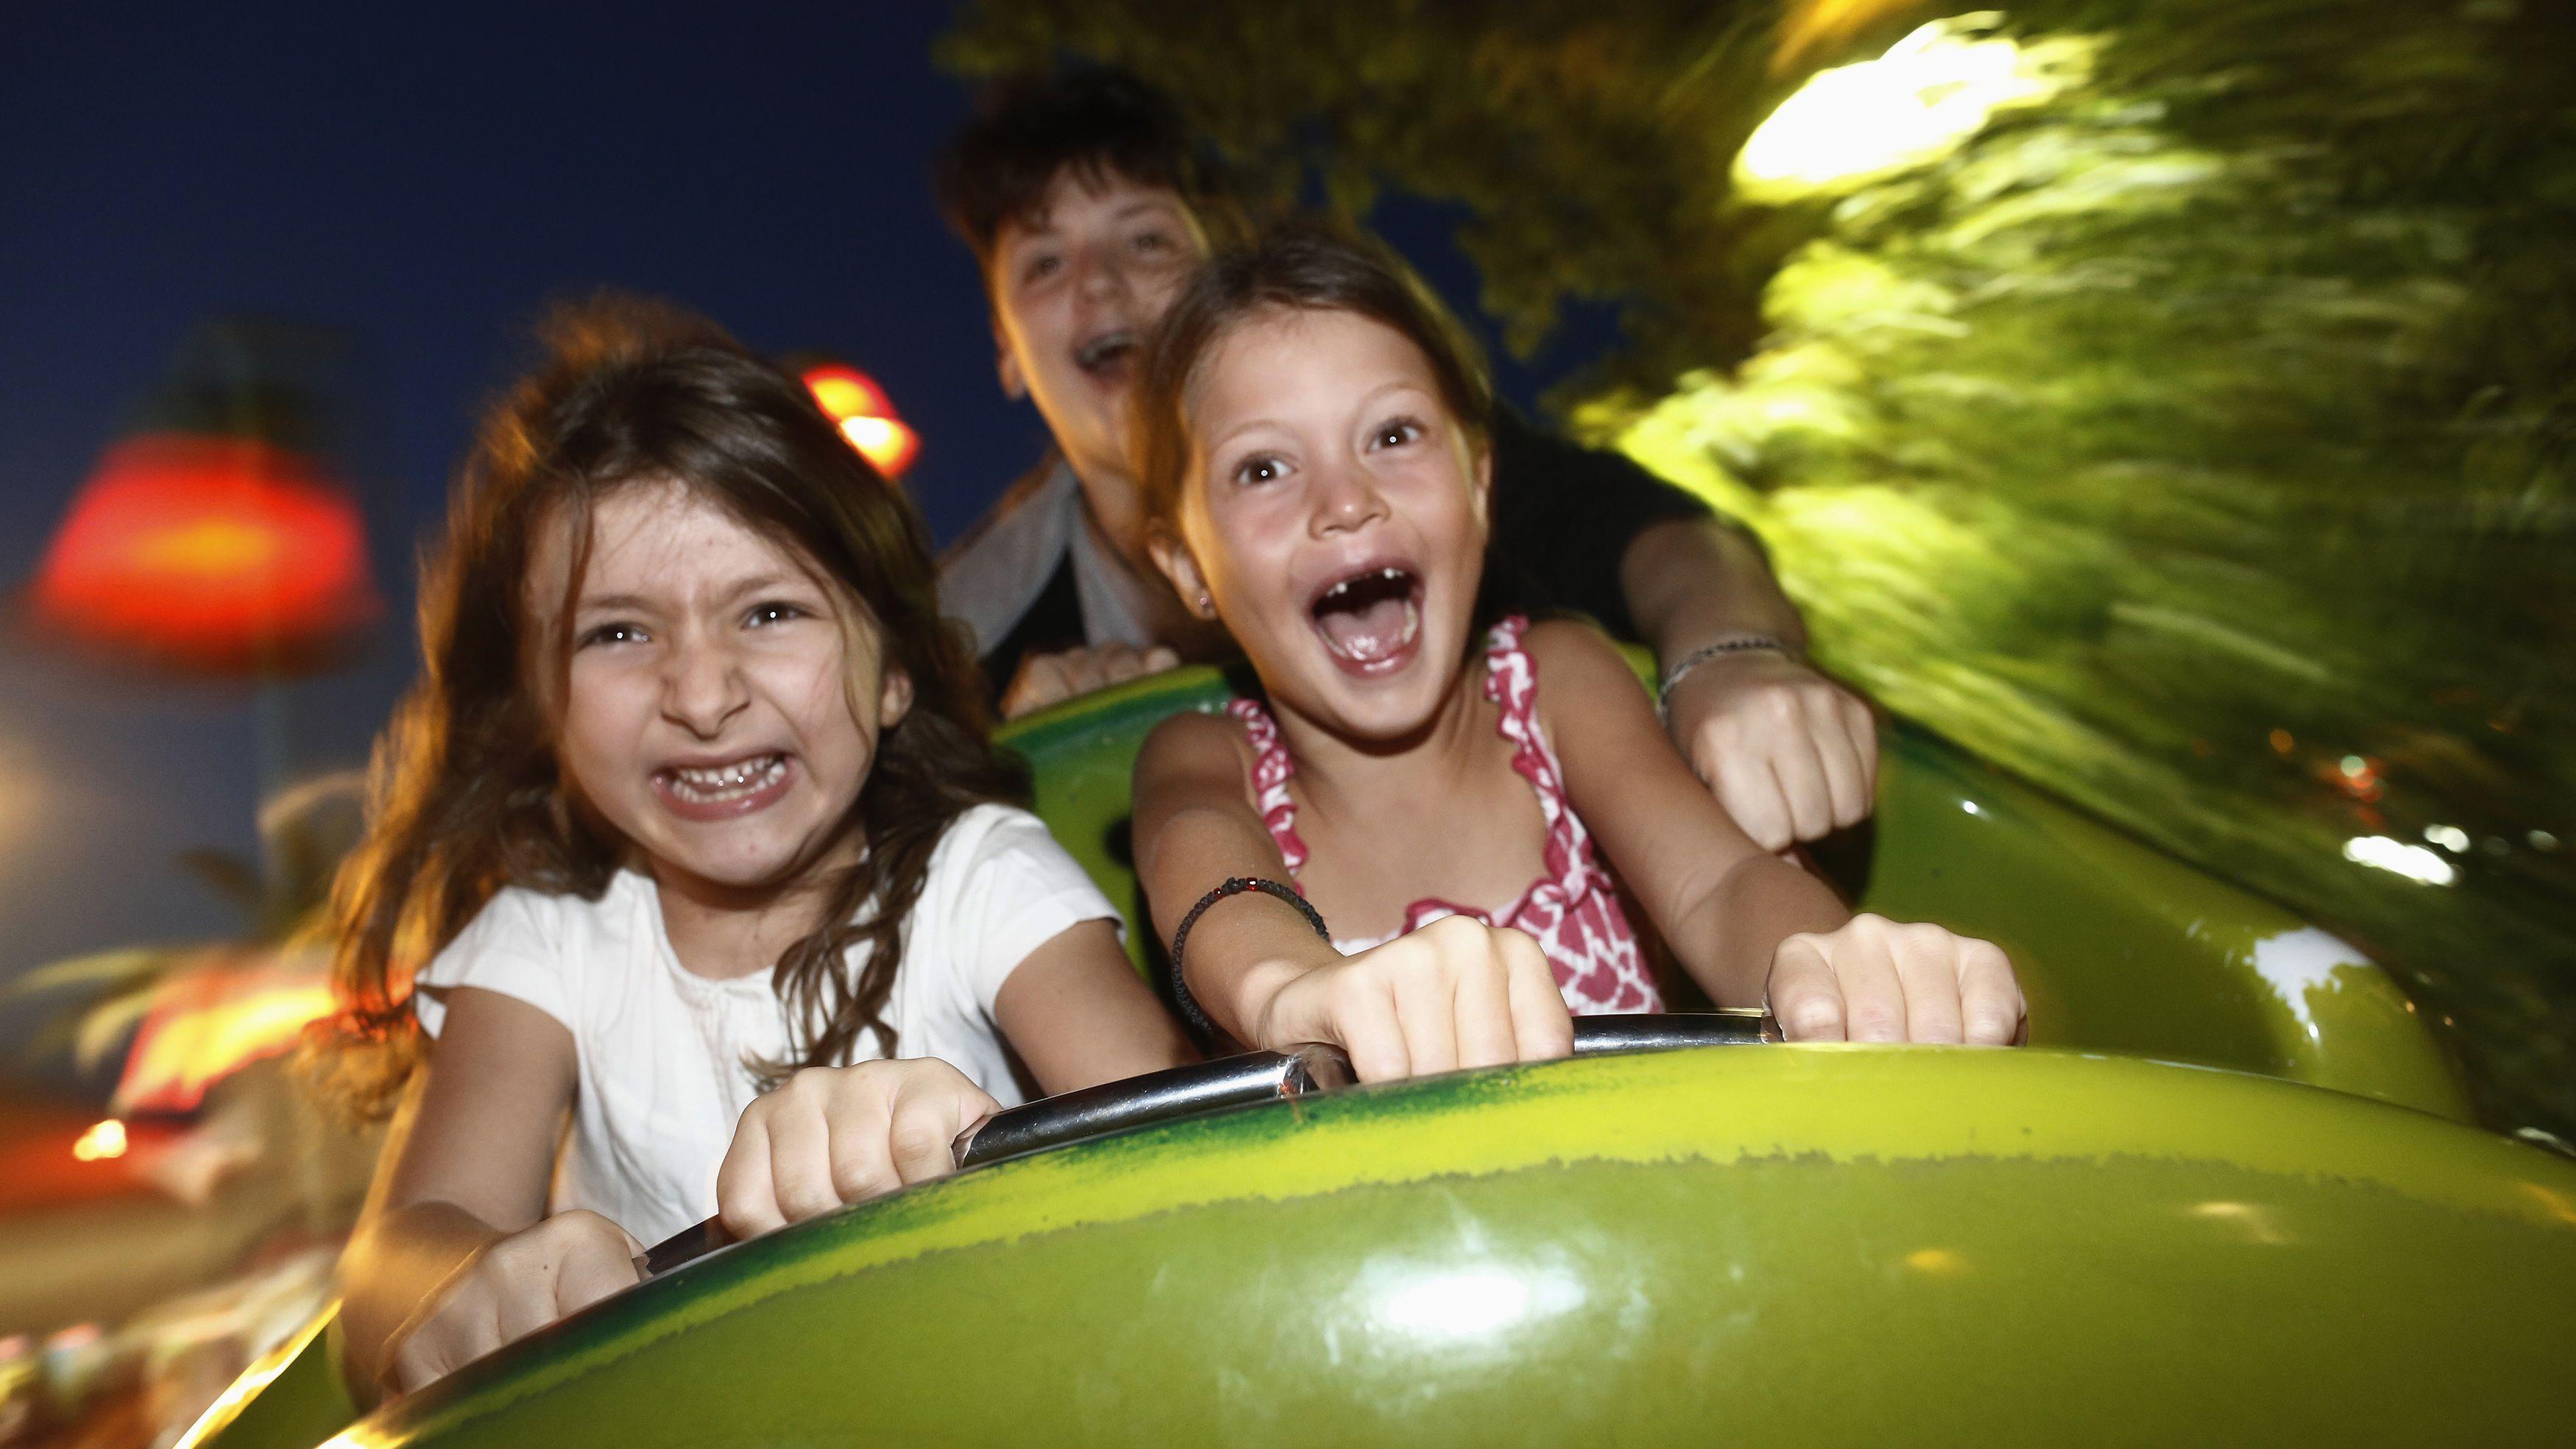 Roller coaster children happy